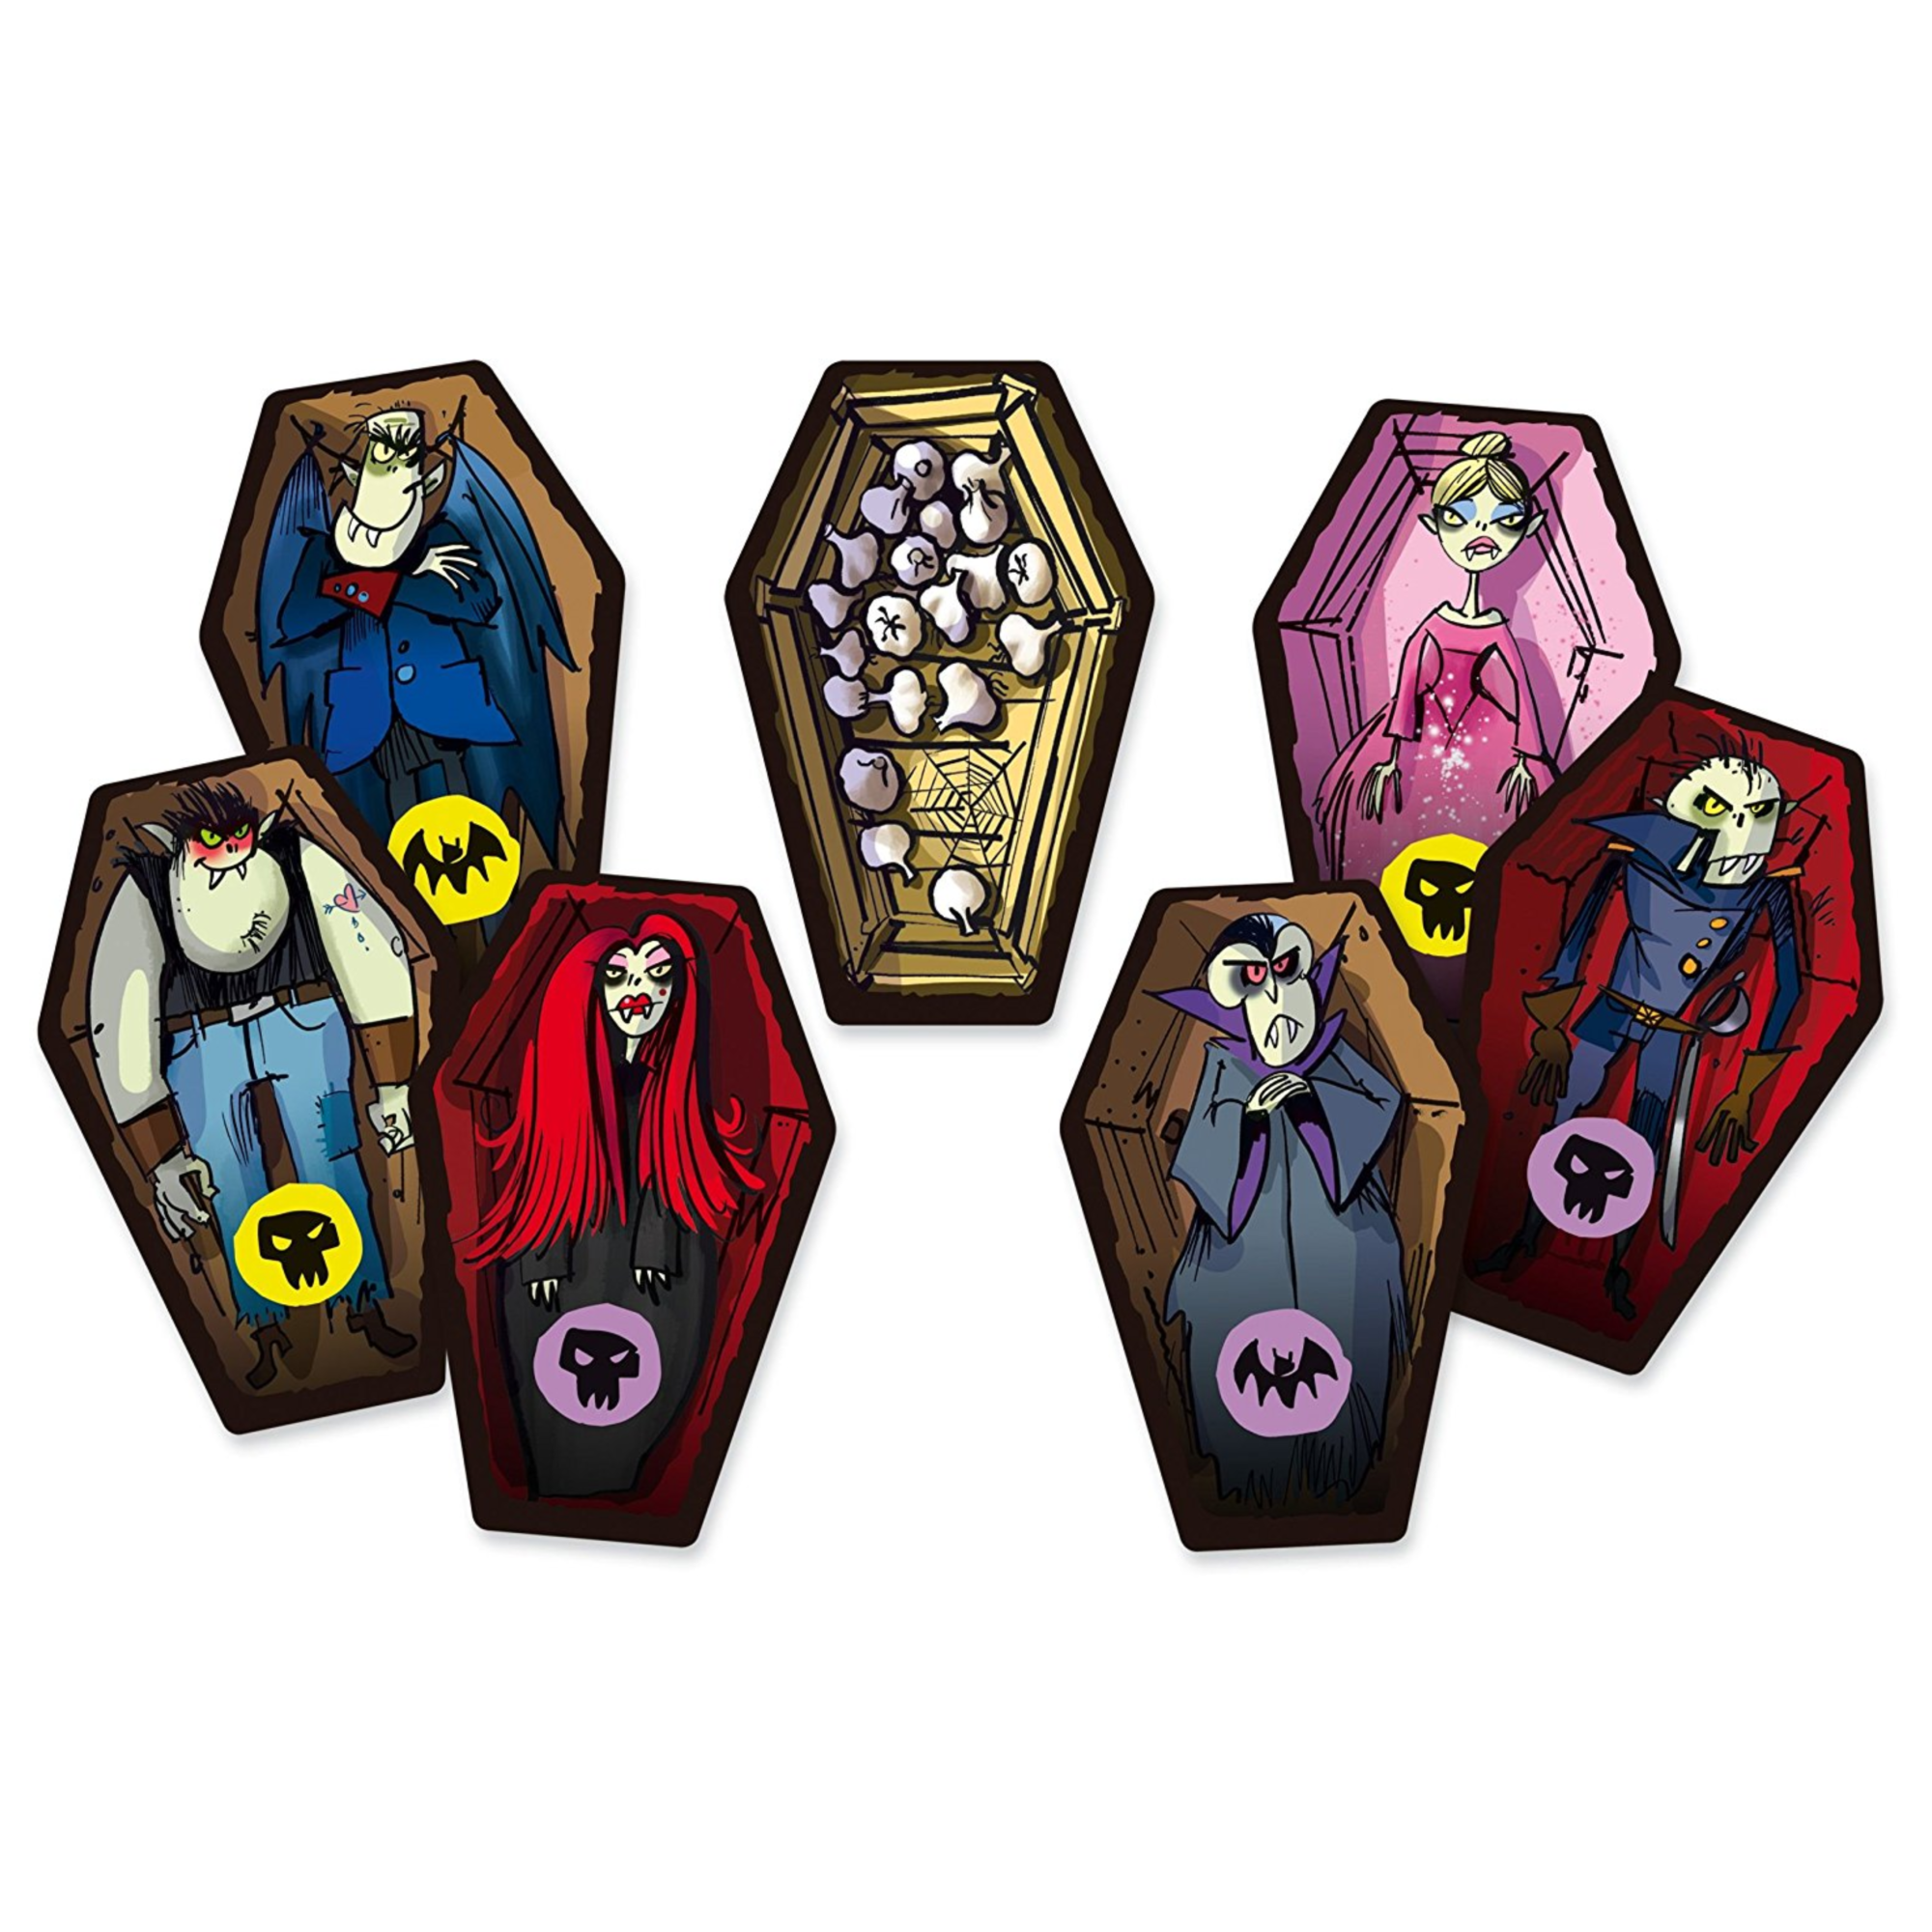 Drei Magier Spiele Clearing Coffins